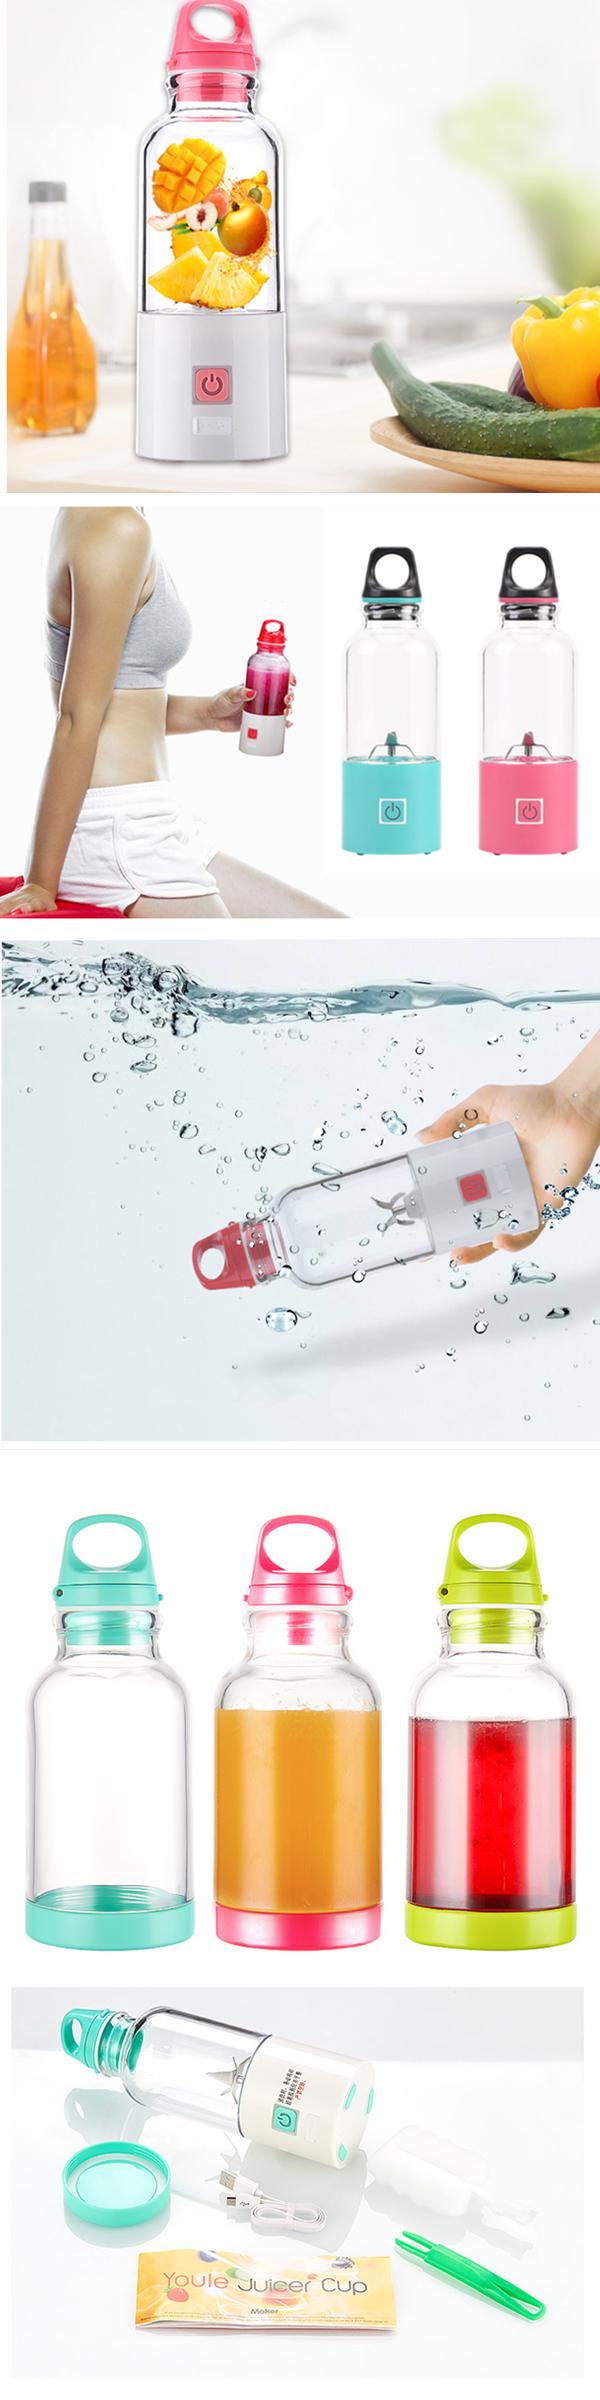 blender-cup-specs-web.jpg